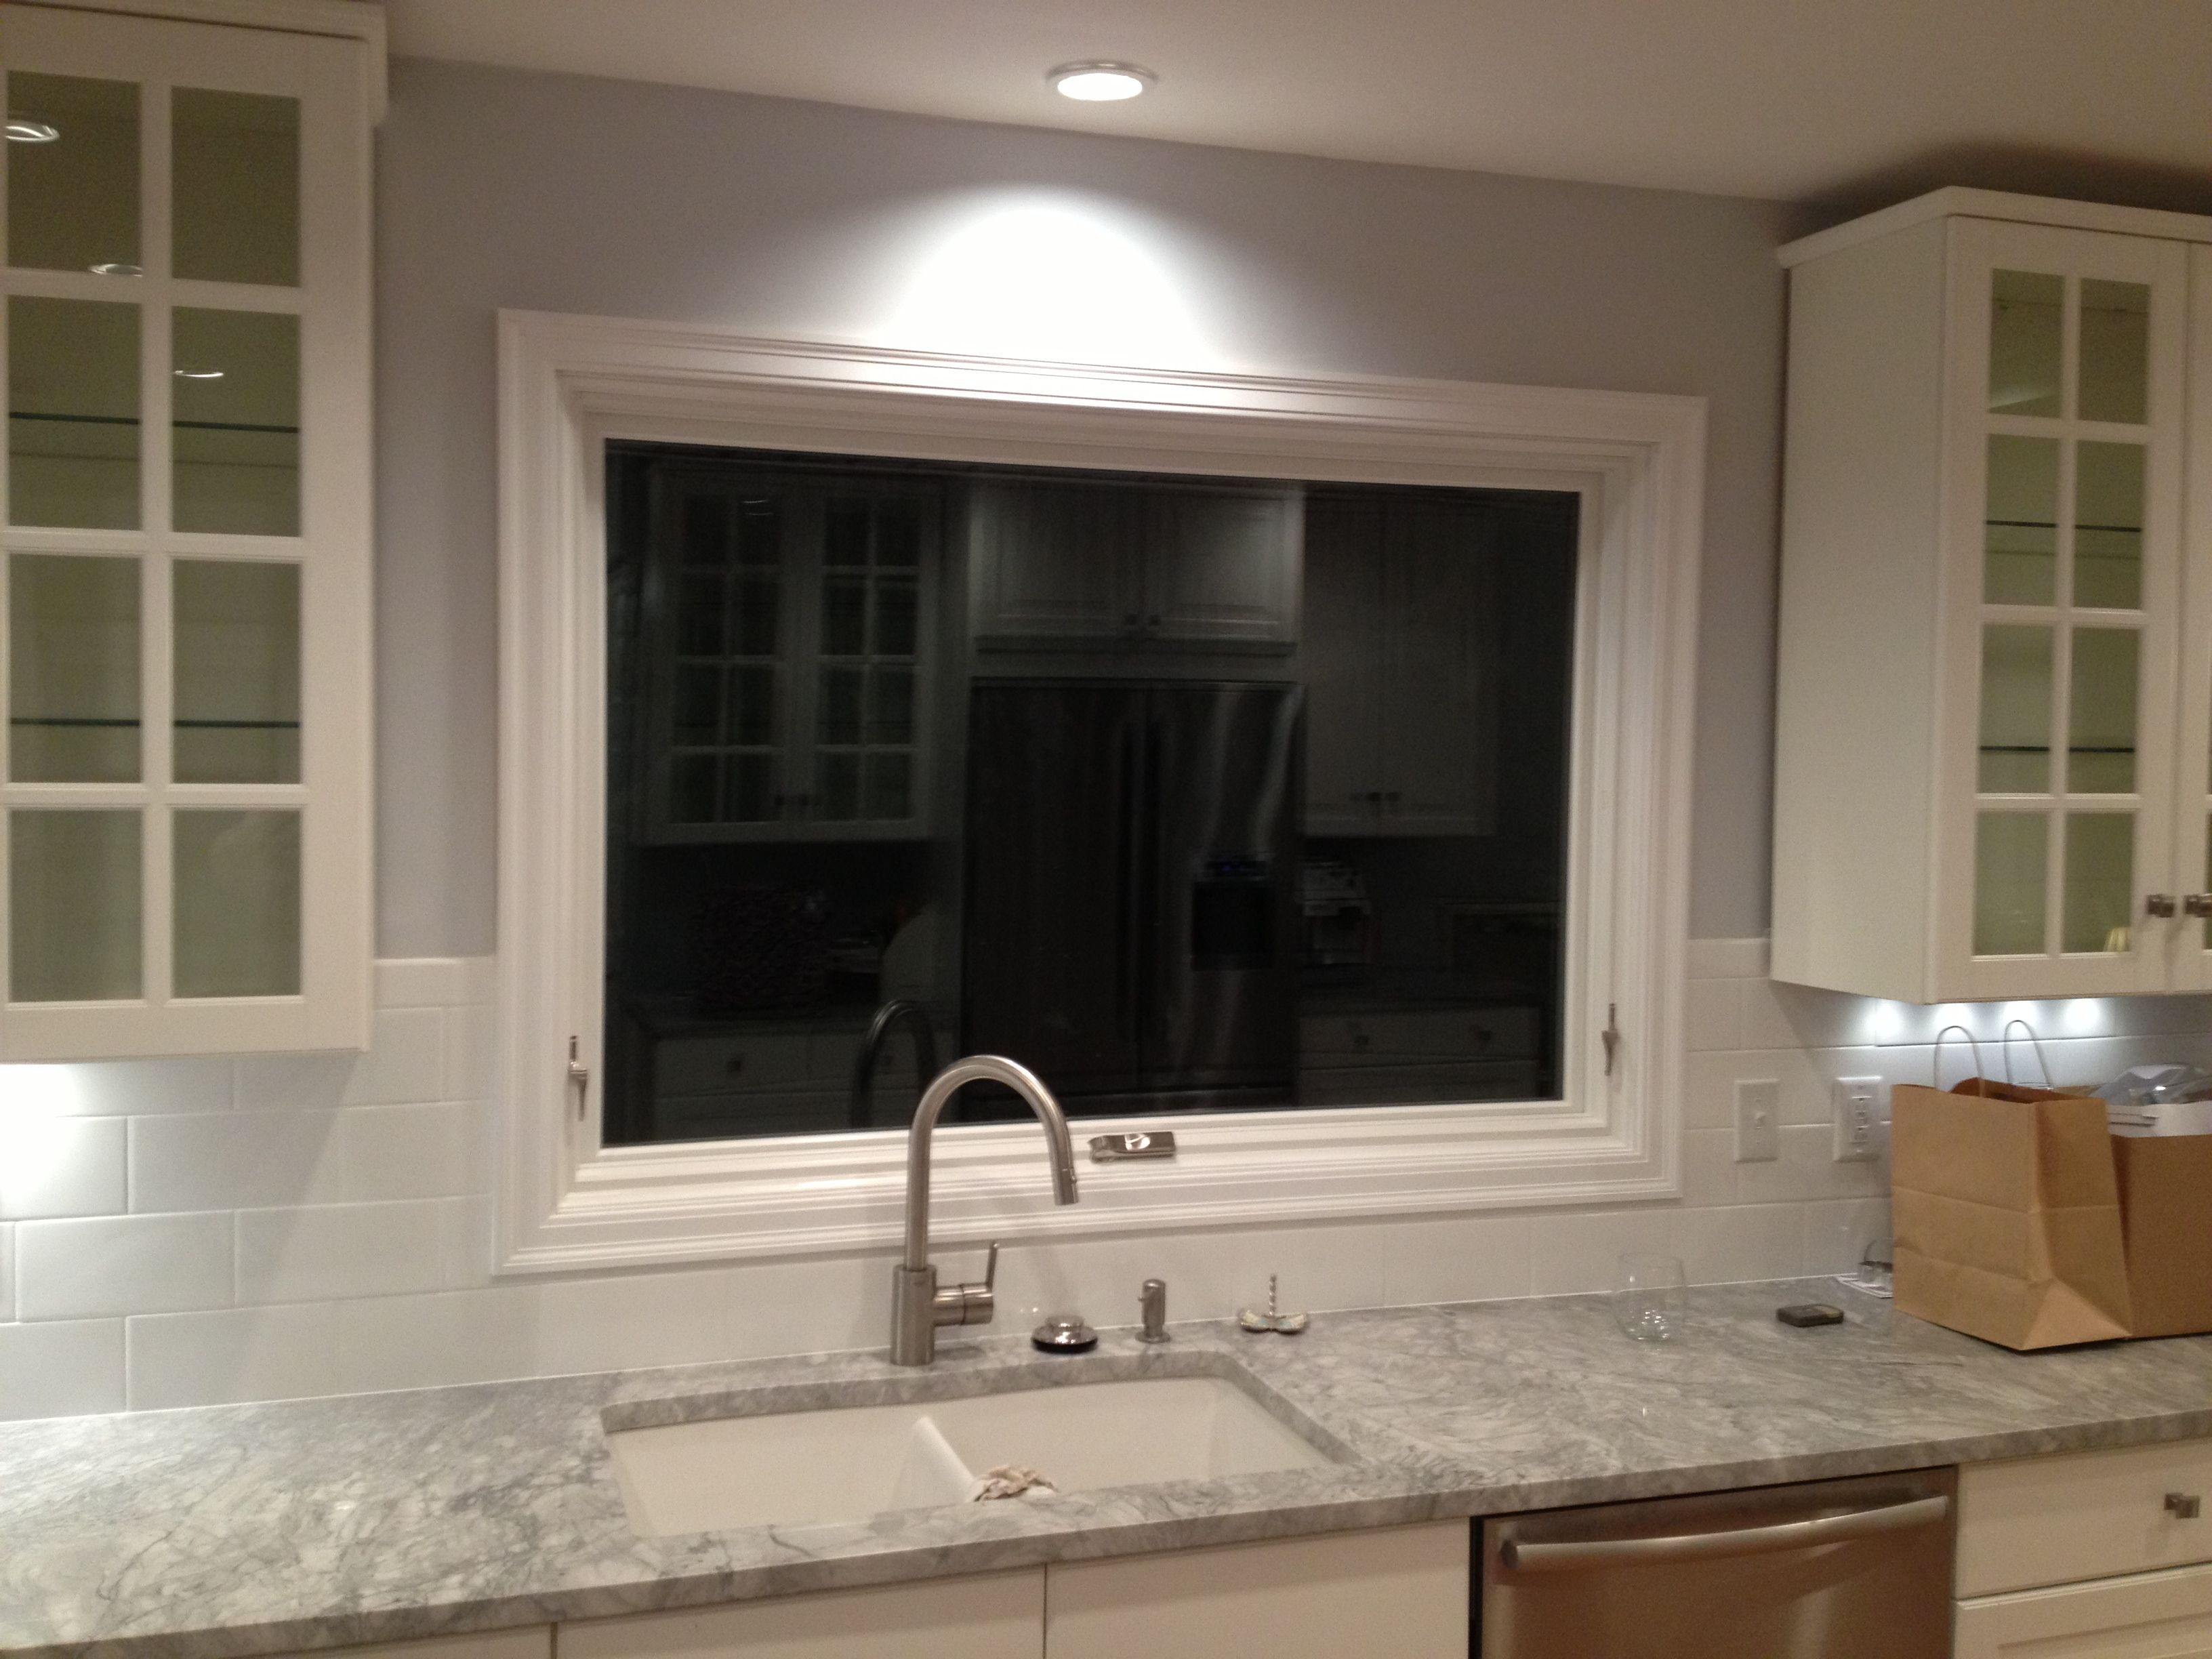 awning of window warranty chart size casement rare image windows service wood customer andersen pella wide full lowes